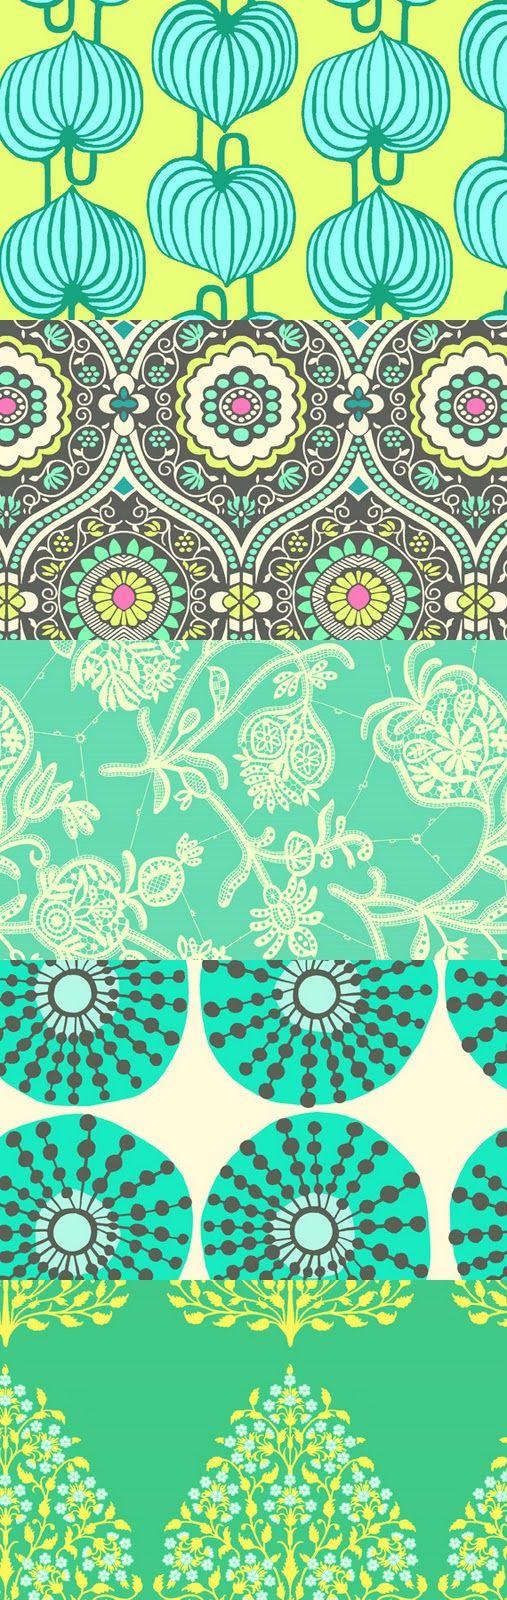 Amy Butler Fabric pieces